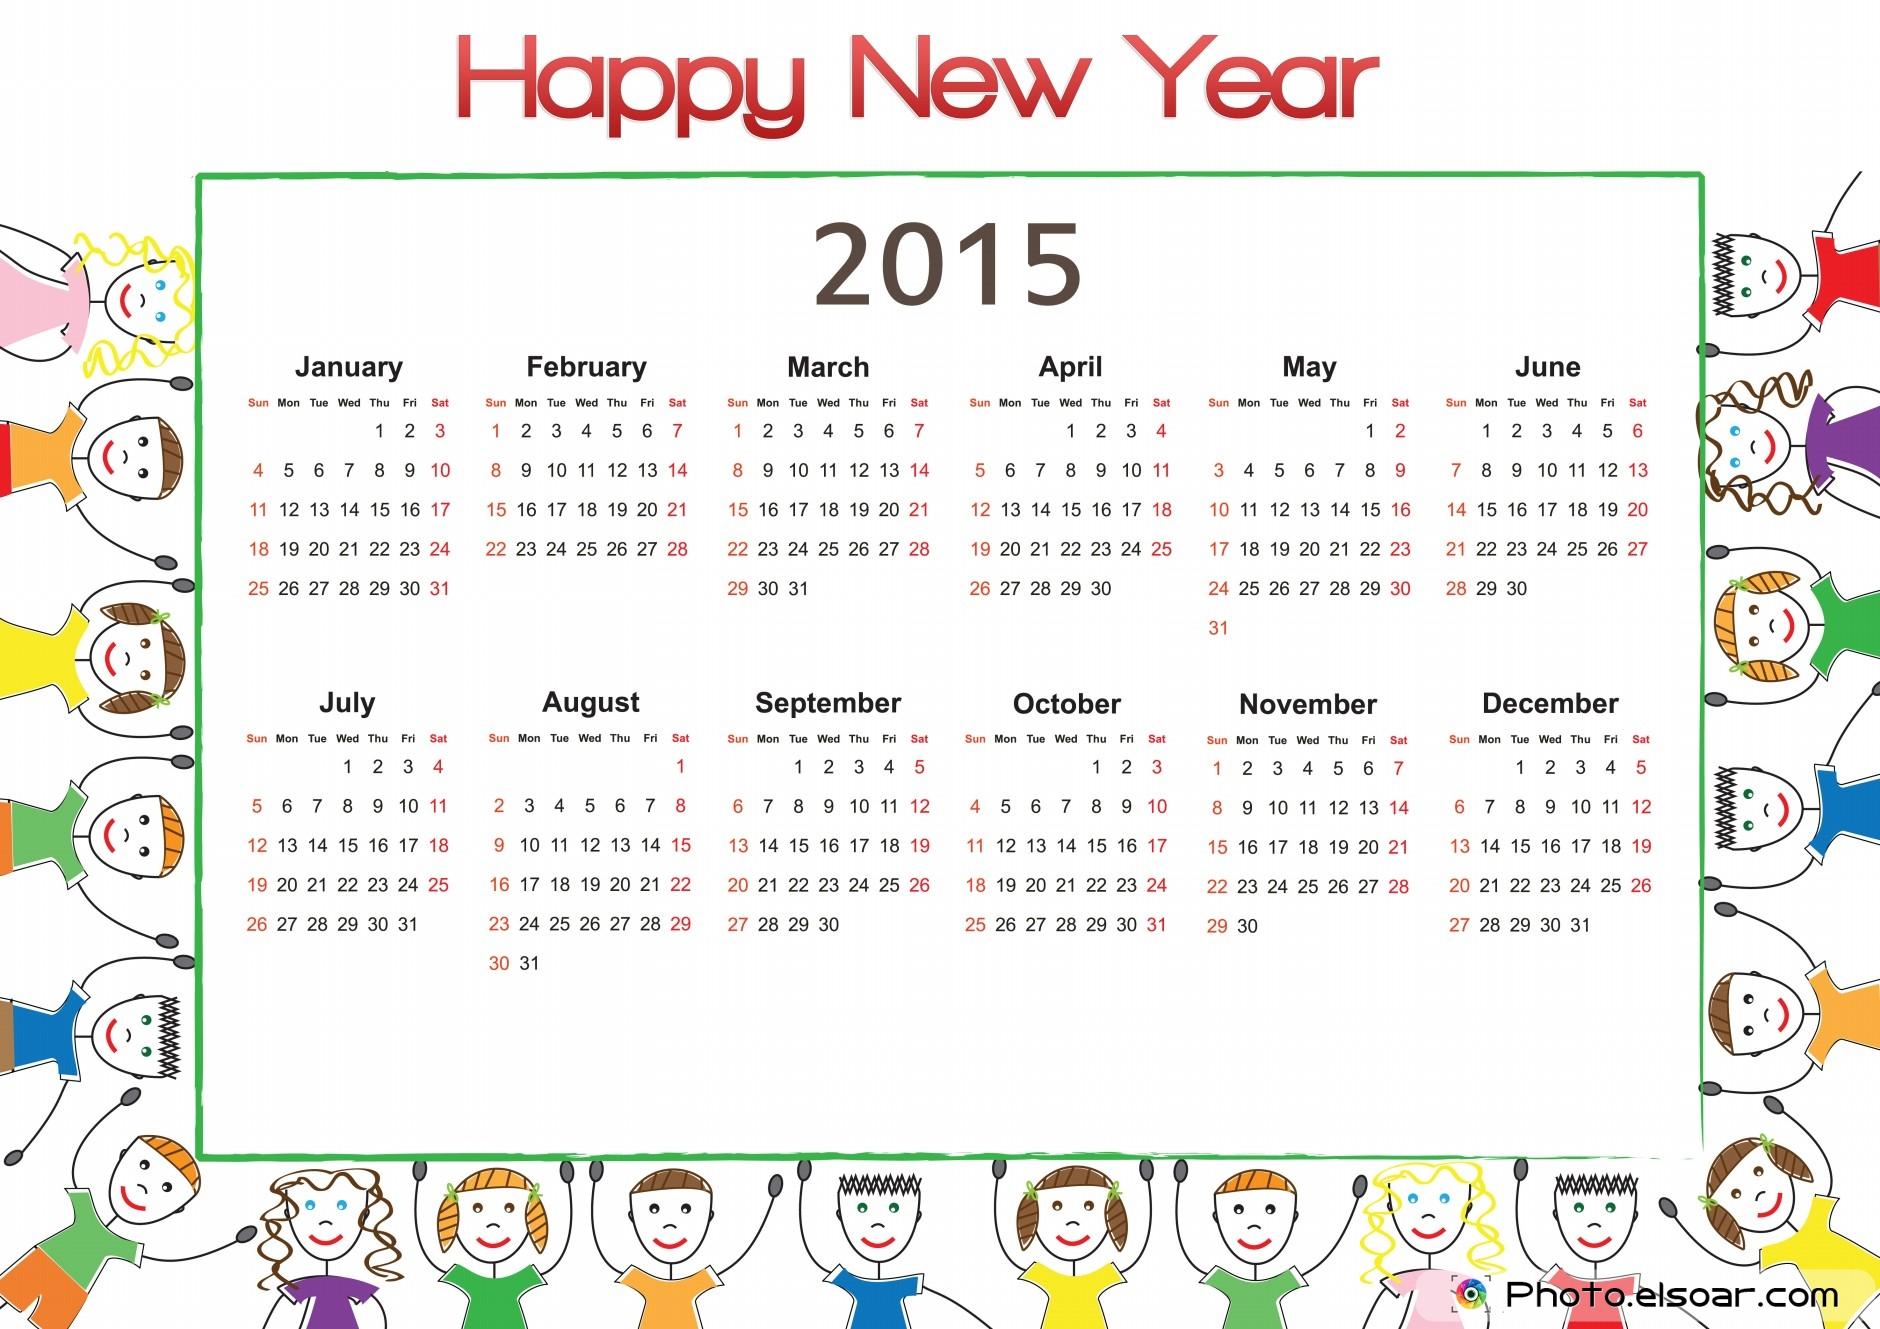 2015 Monthly Calendar Design